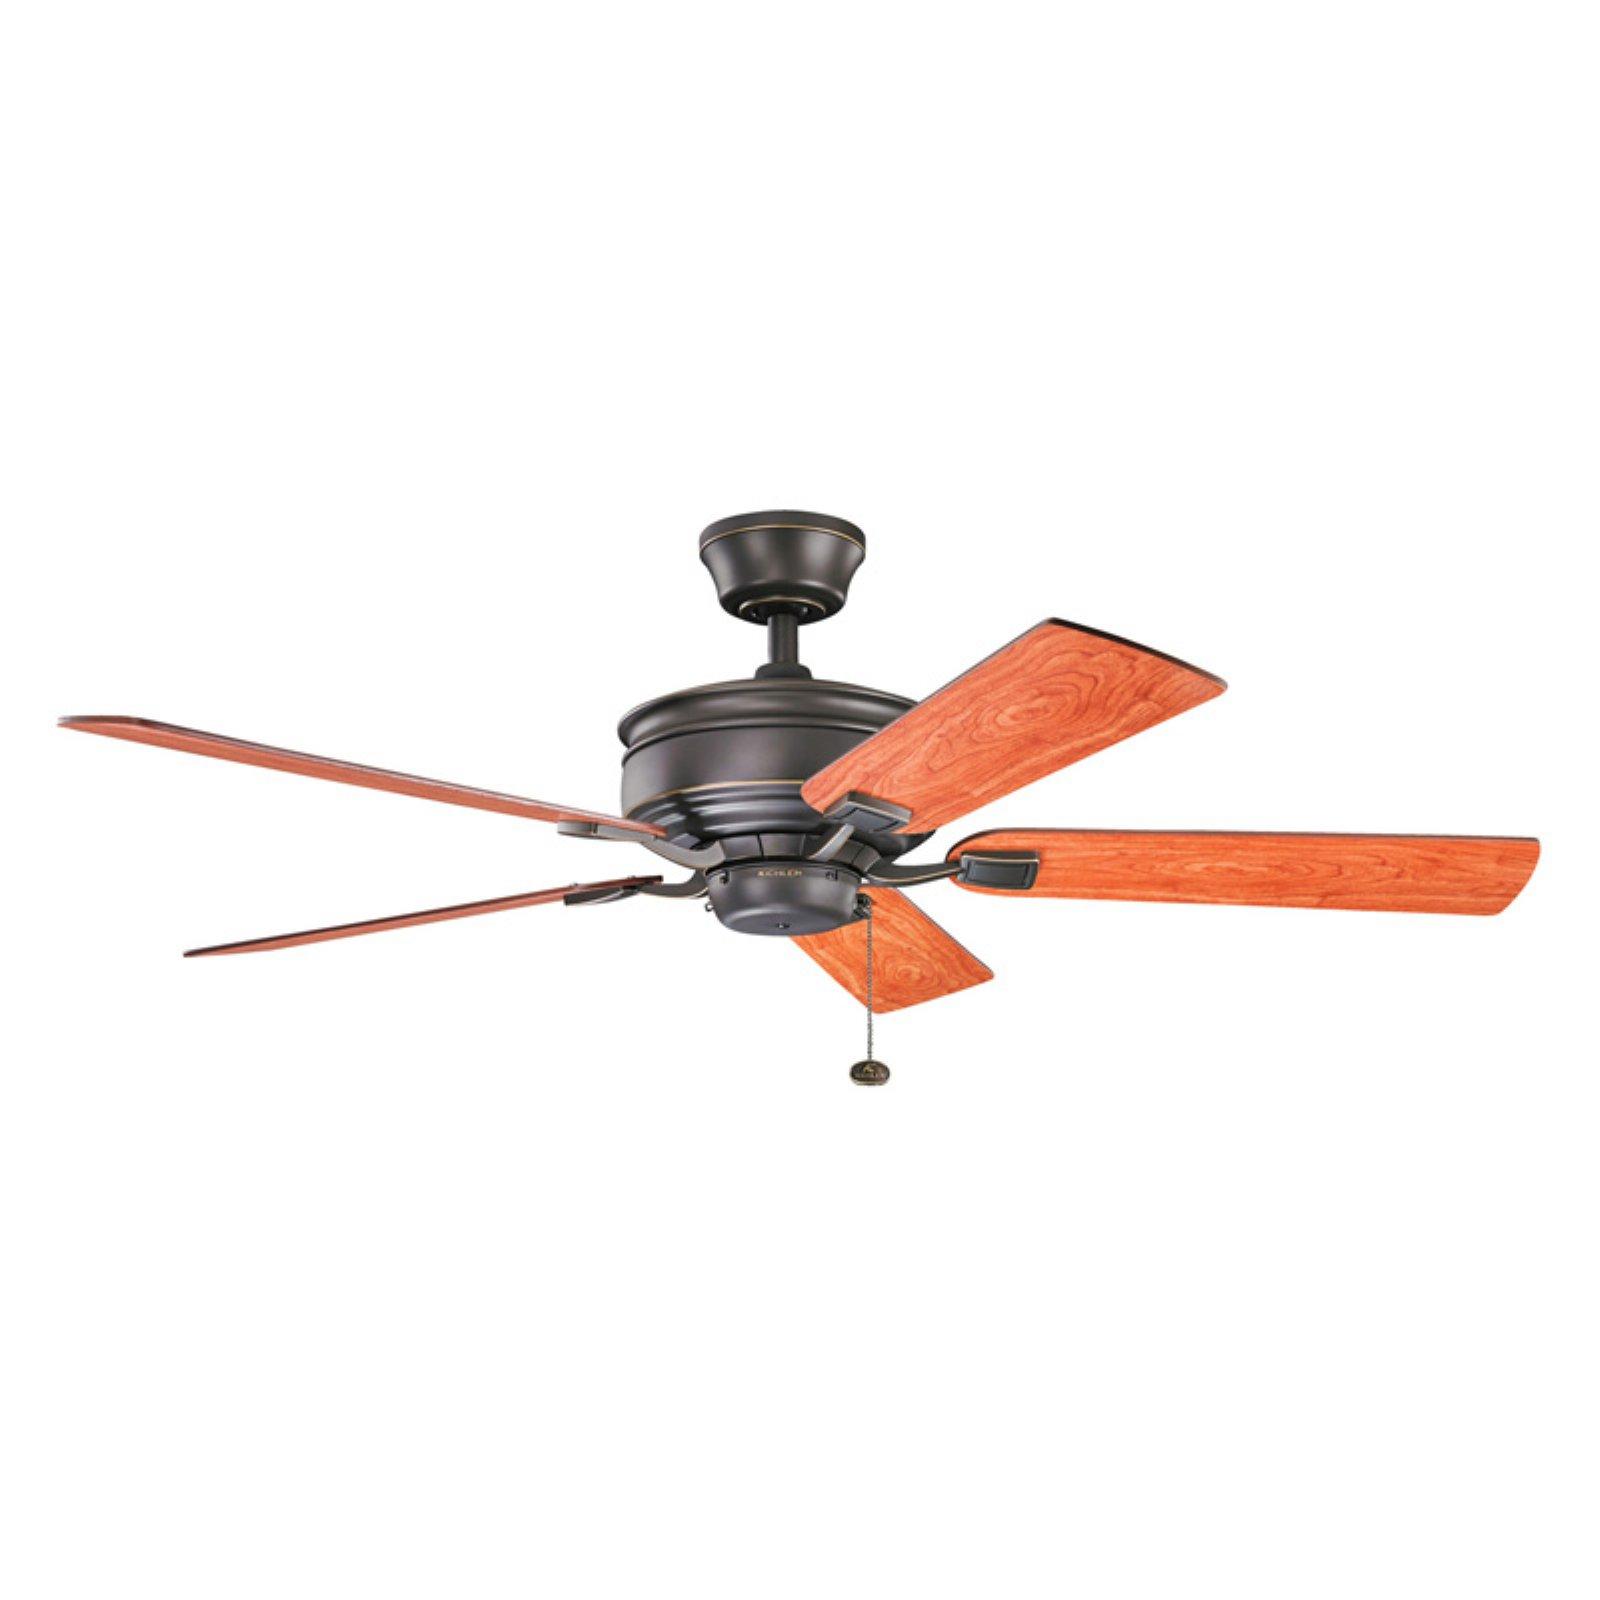 Kichler Duval 52-in. Indoor Ceiling Fan